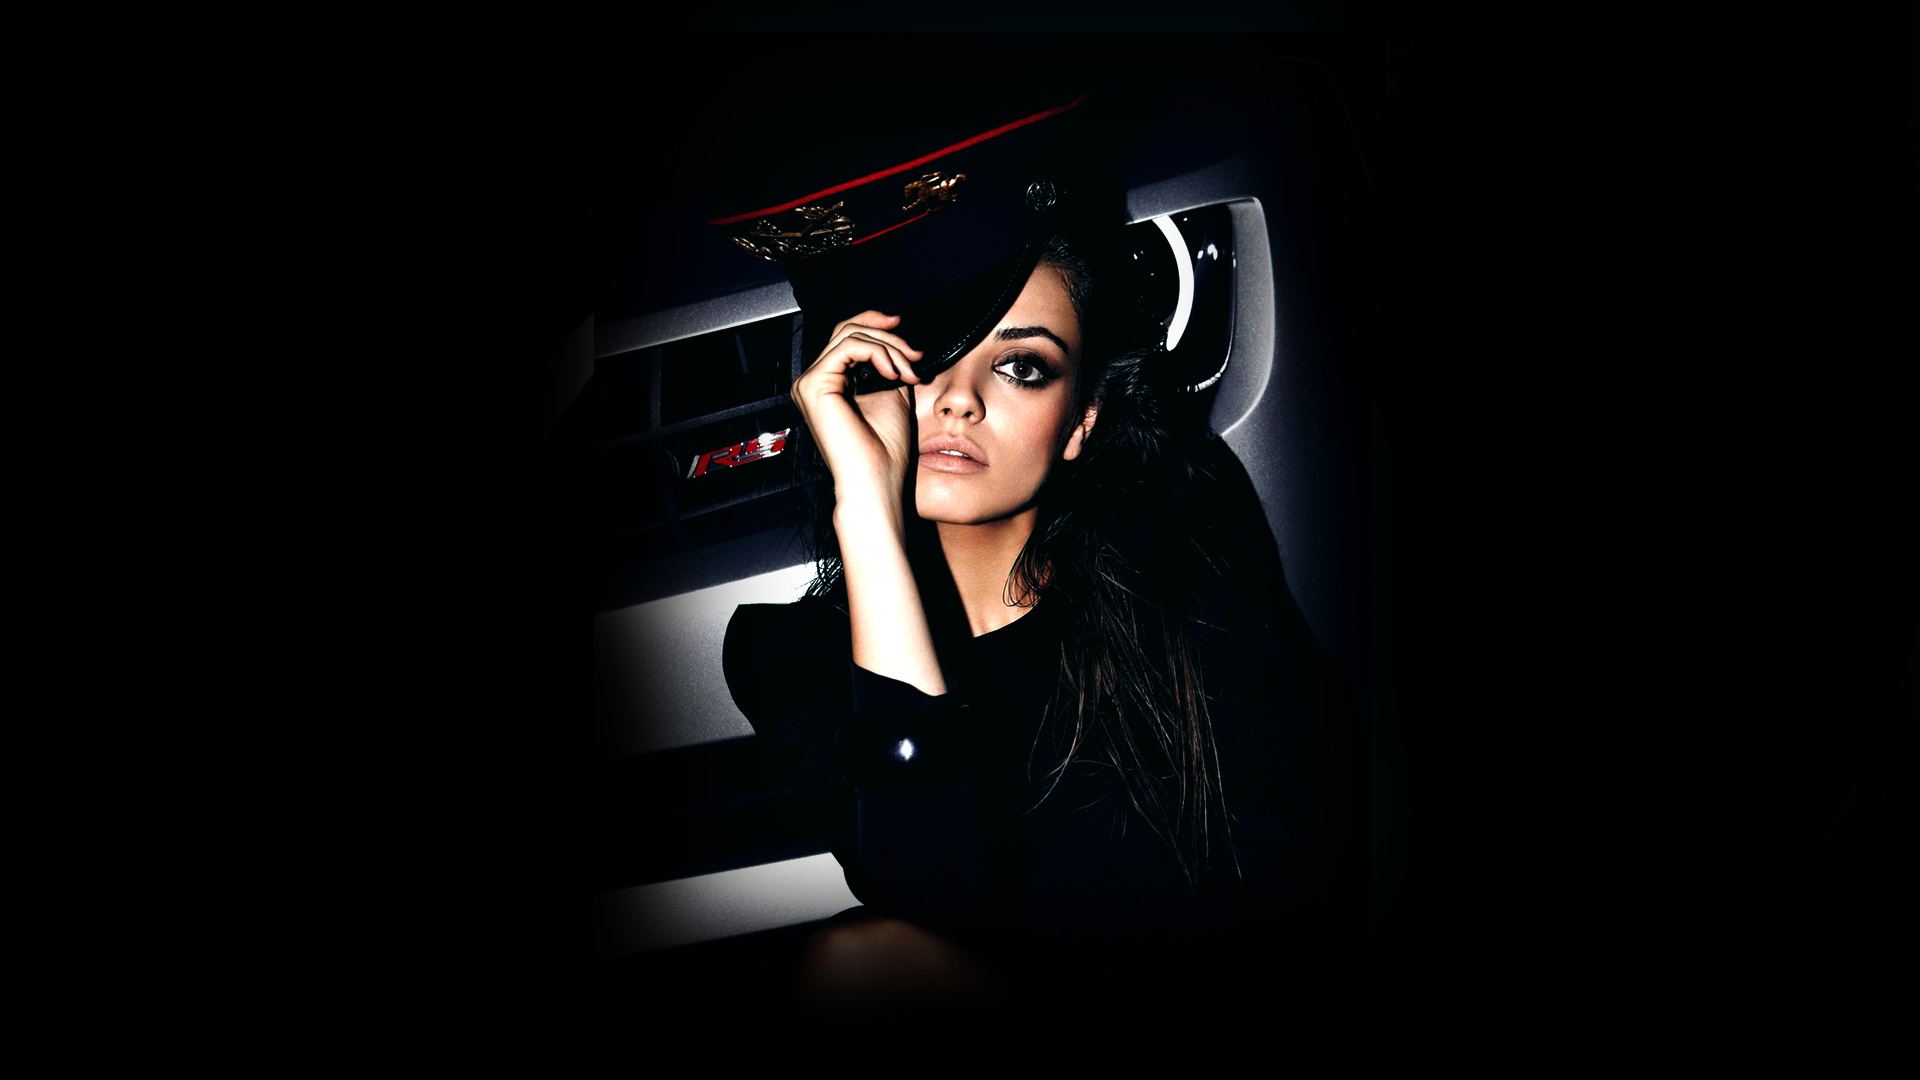 Mila Kunis Wallpaper 51805